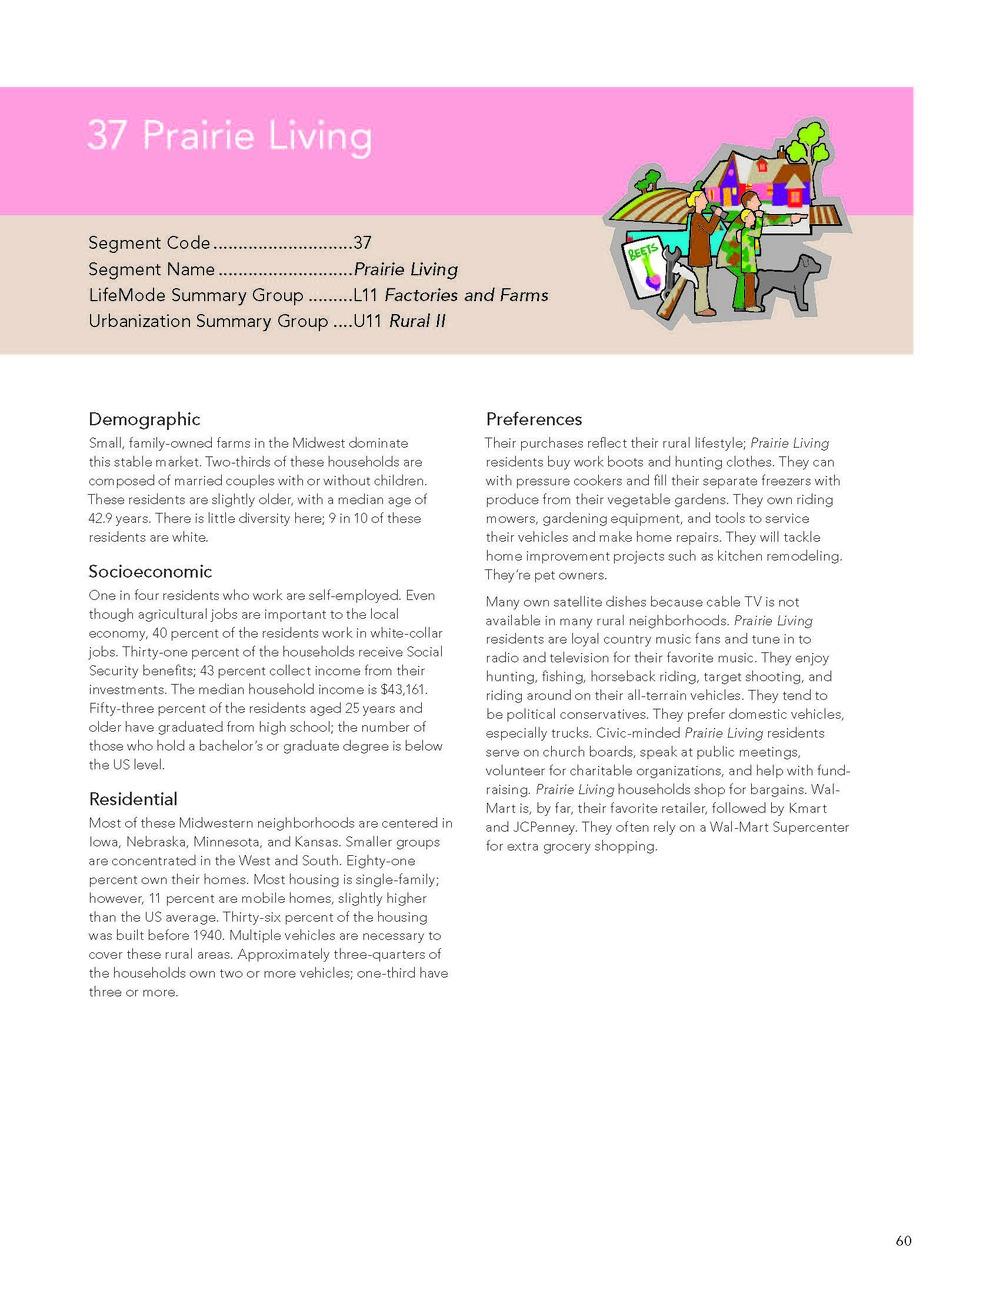 tapestry-segmentation_Page_63.jpg